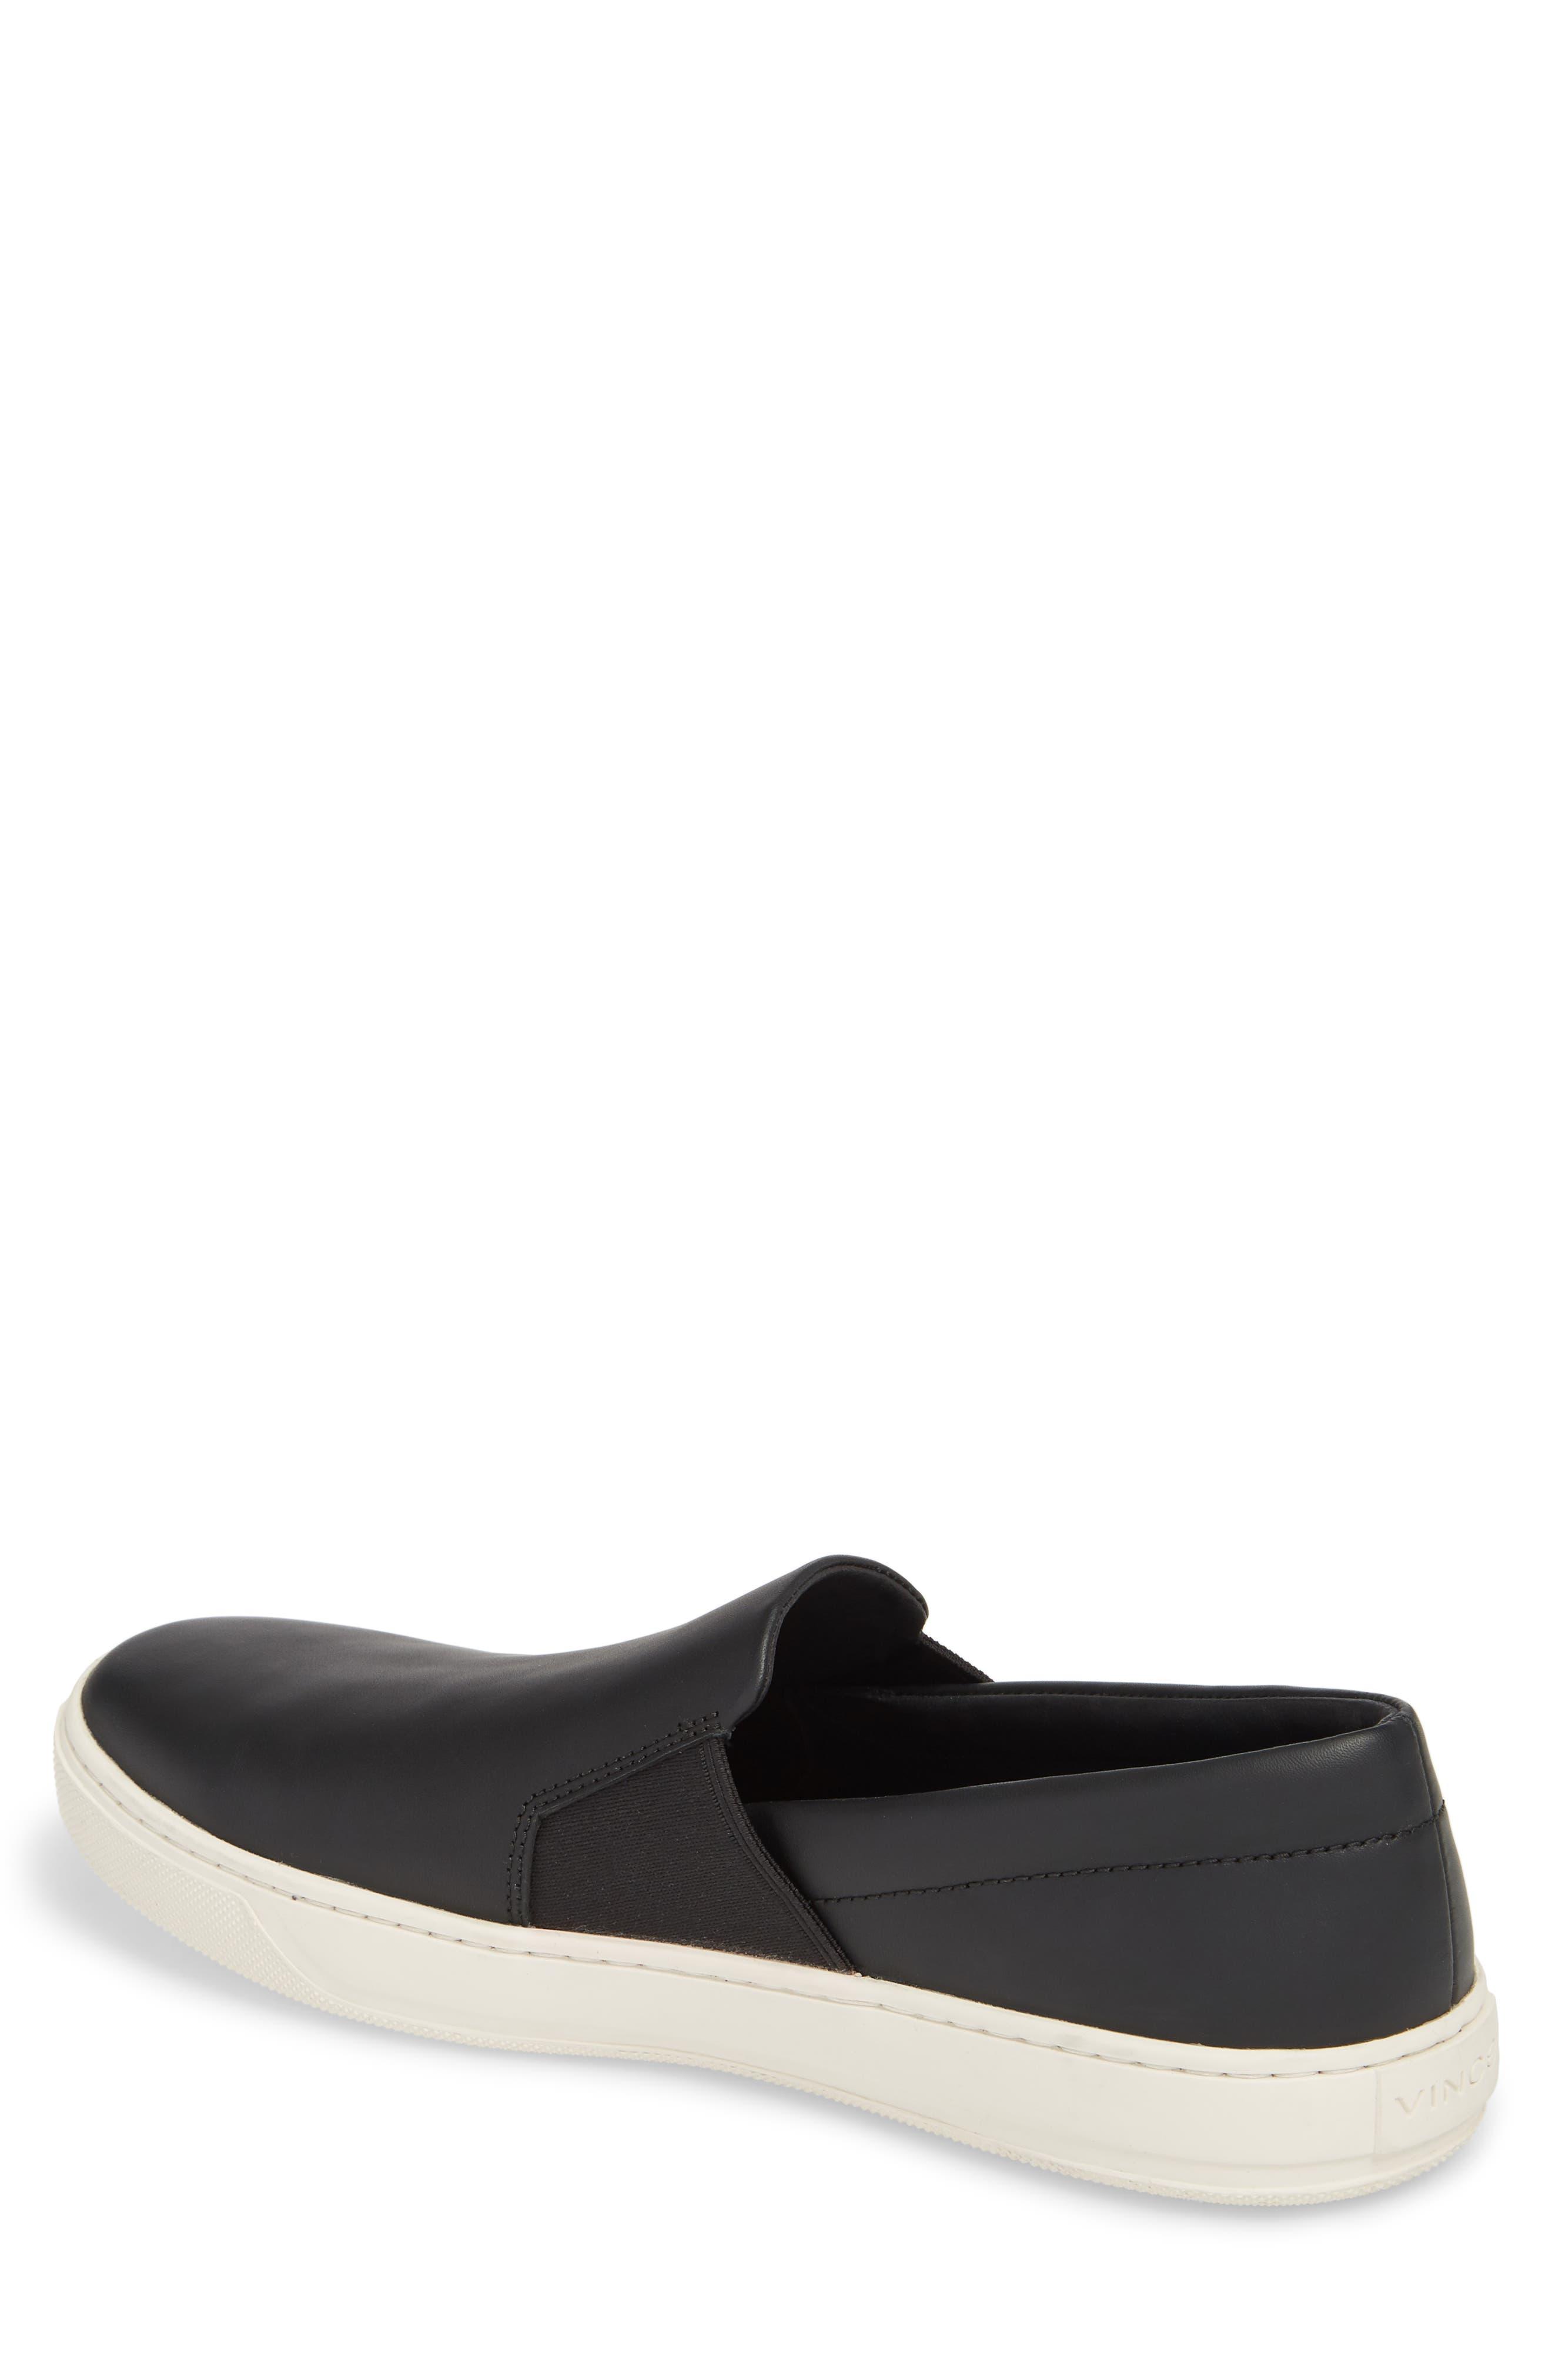 Vince | Arbor Slip-On Sneaker | HauteLook